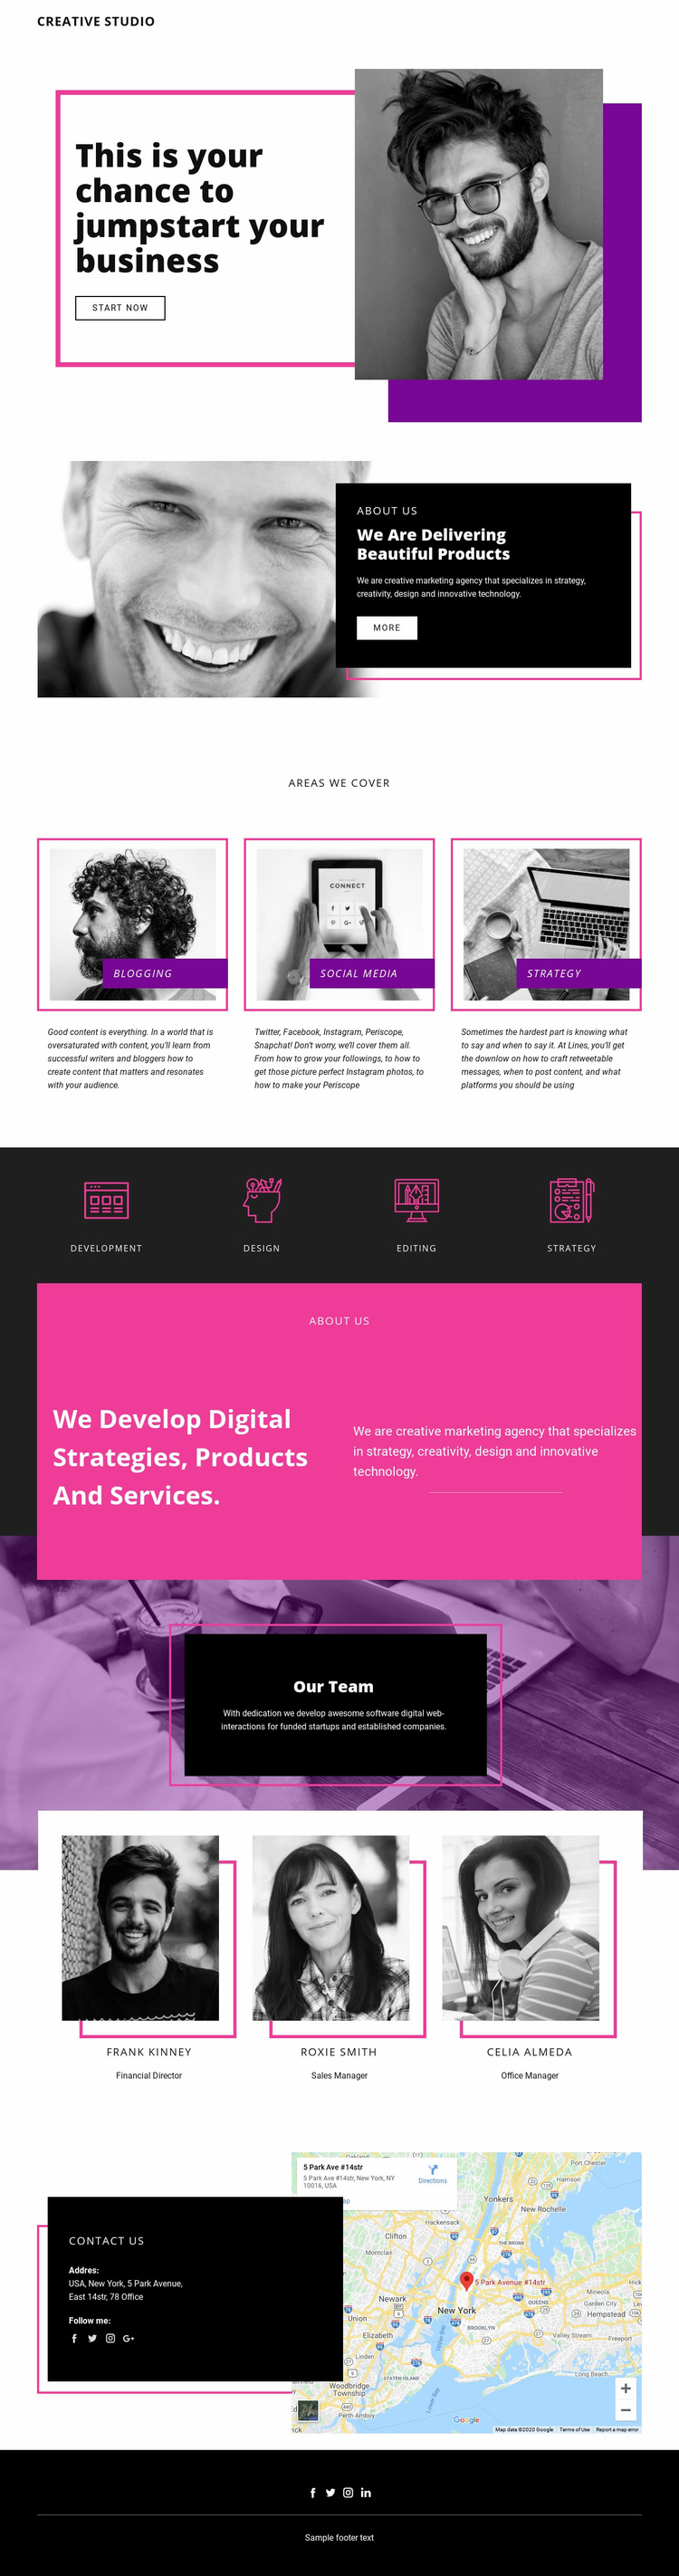 Digital Studio Web Page Design